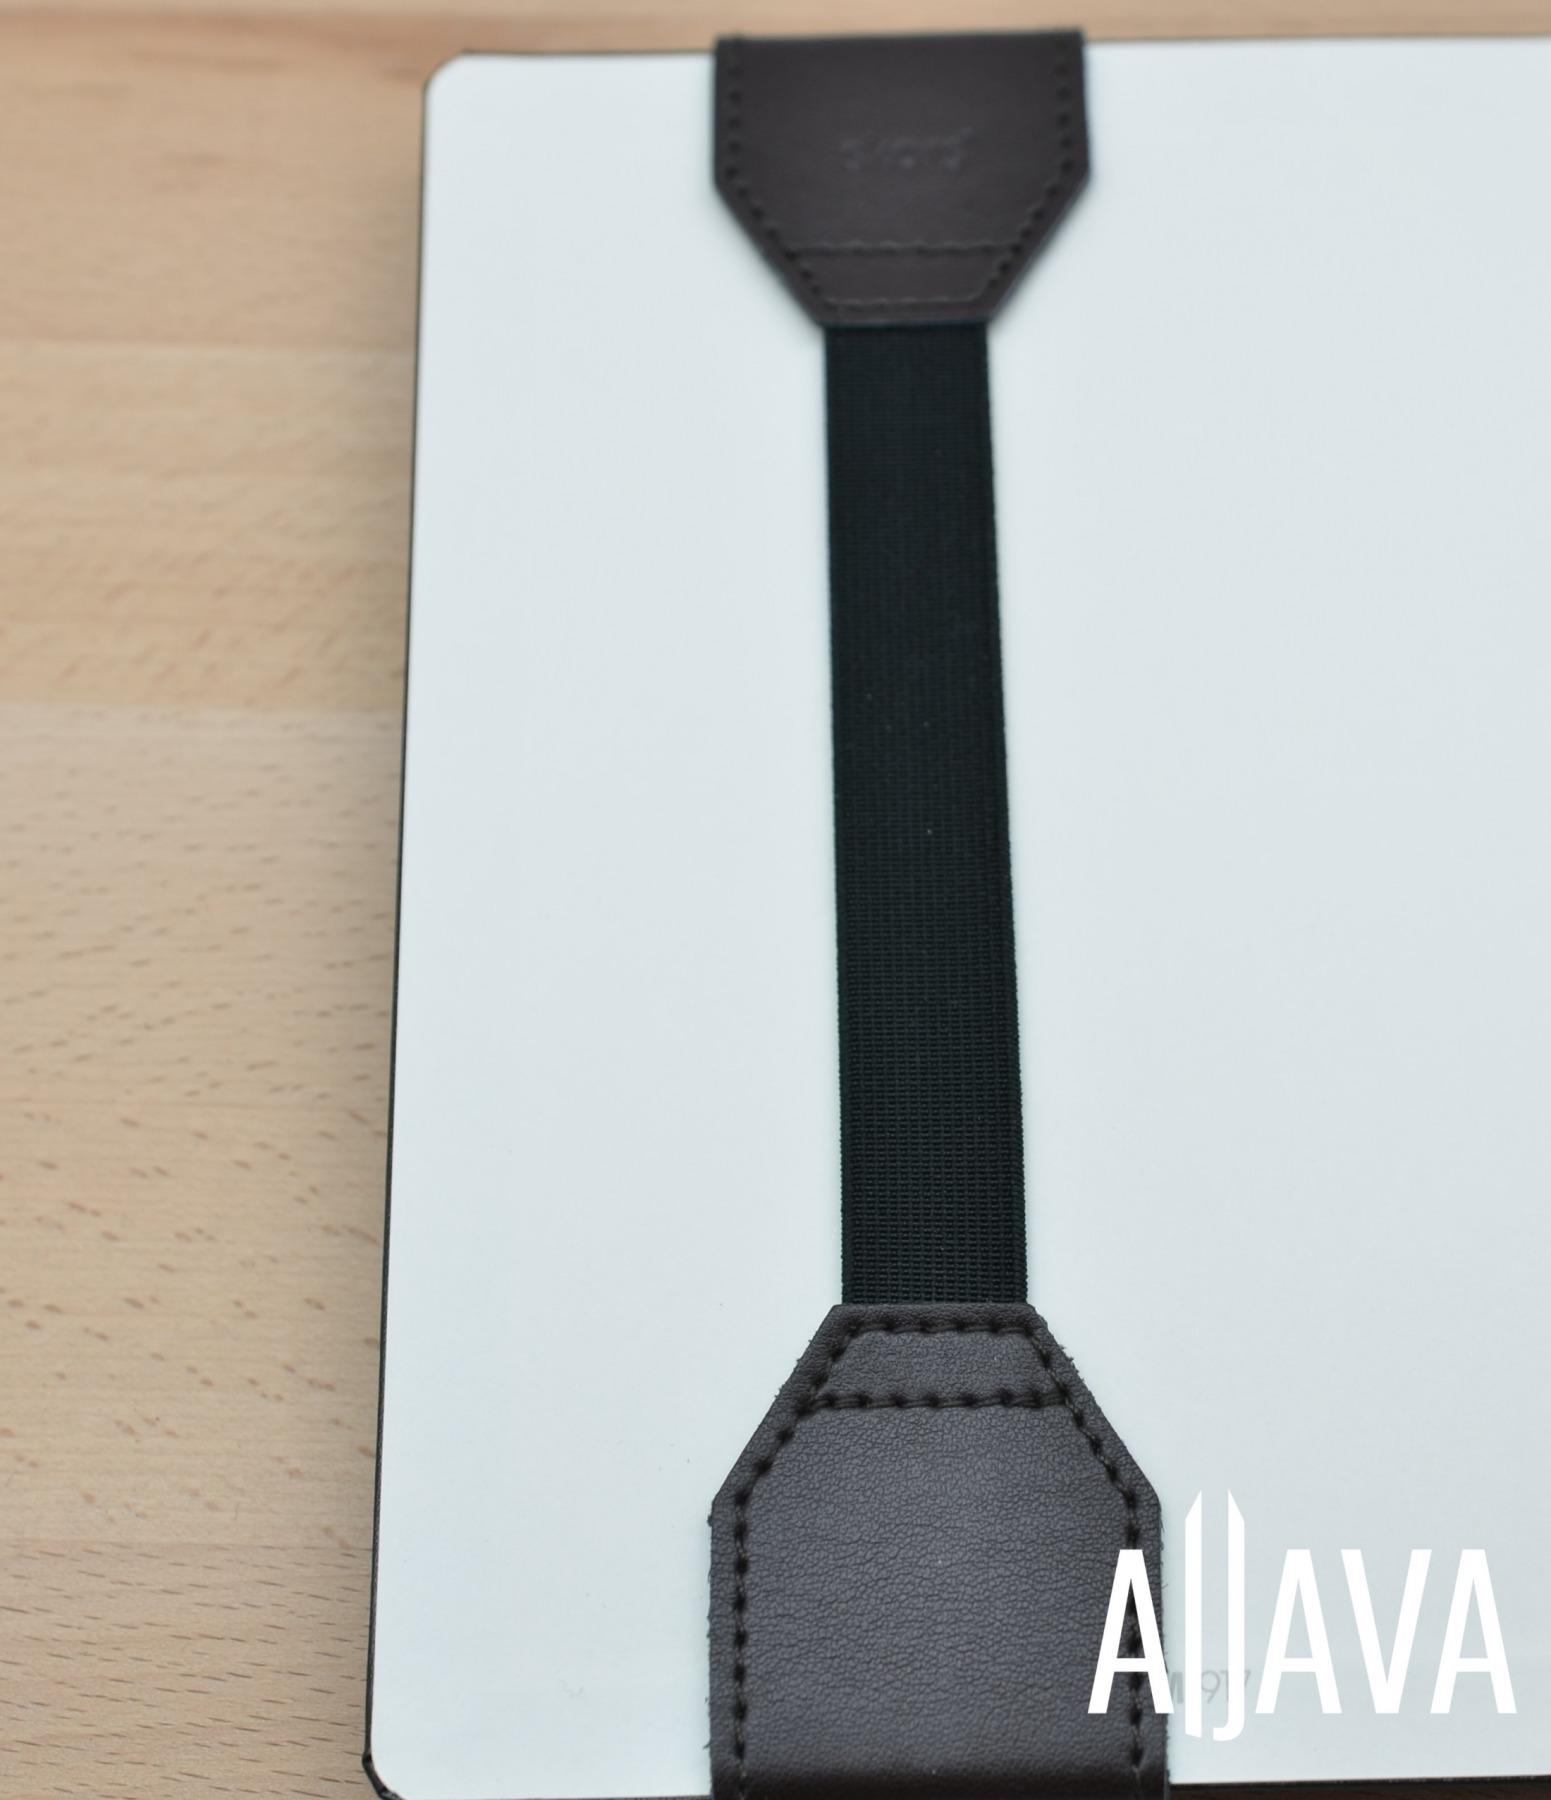 ALjAVA Louis Rindspaltleder: Braun Naht: Braun - 3